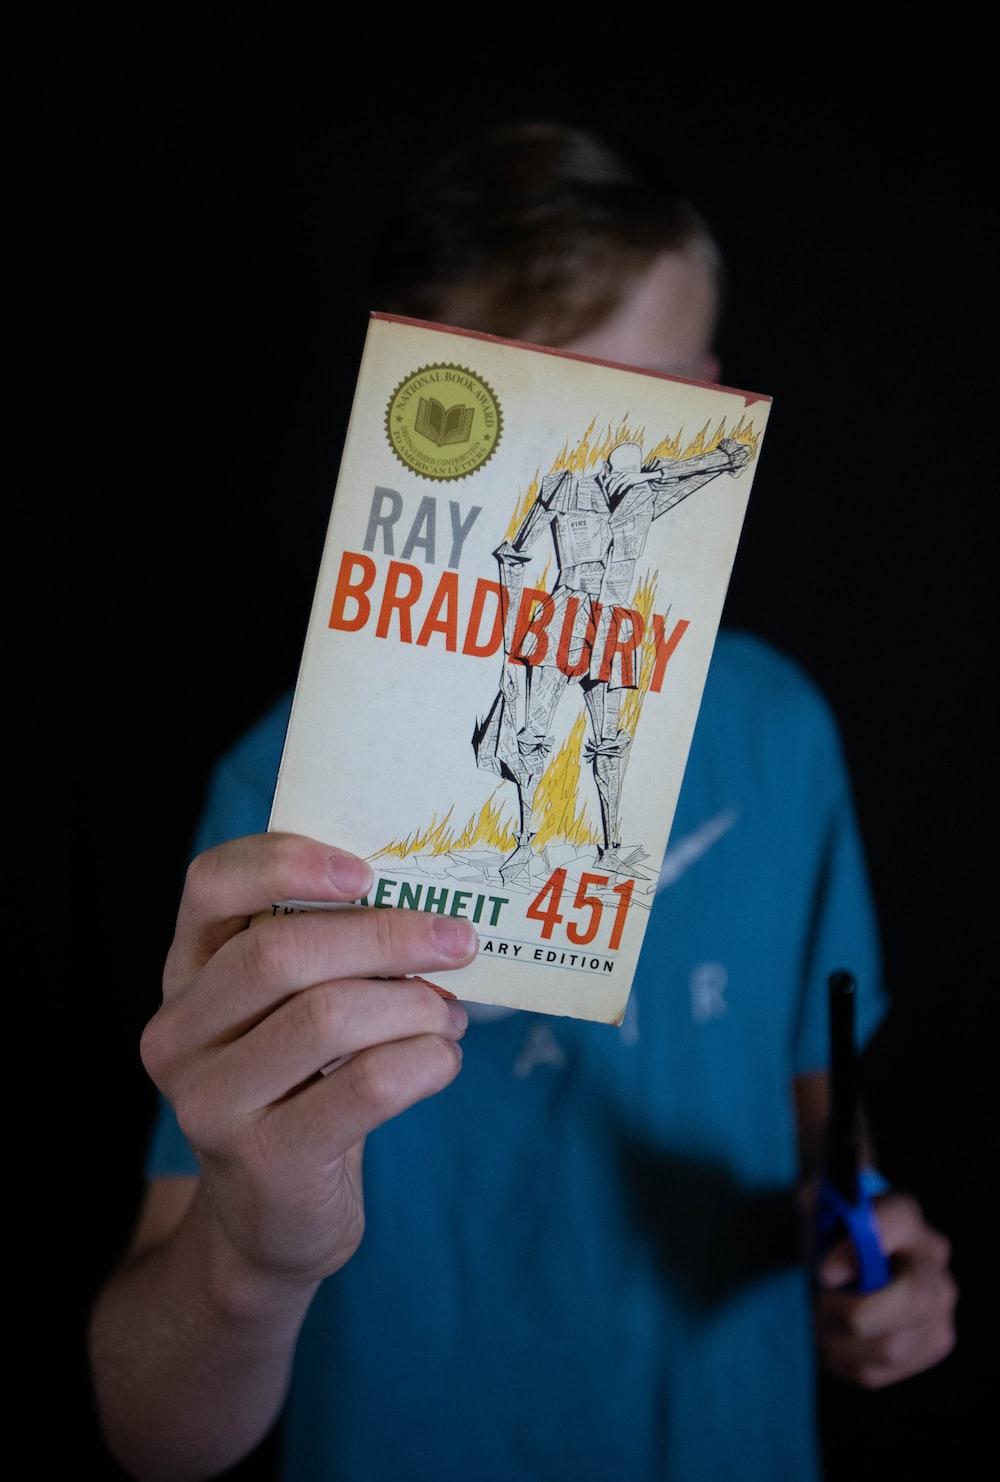 person holding Ray Bradbury book